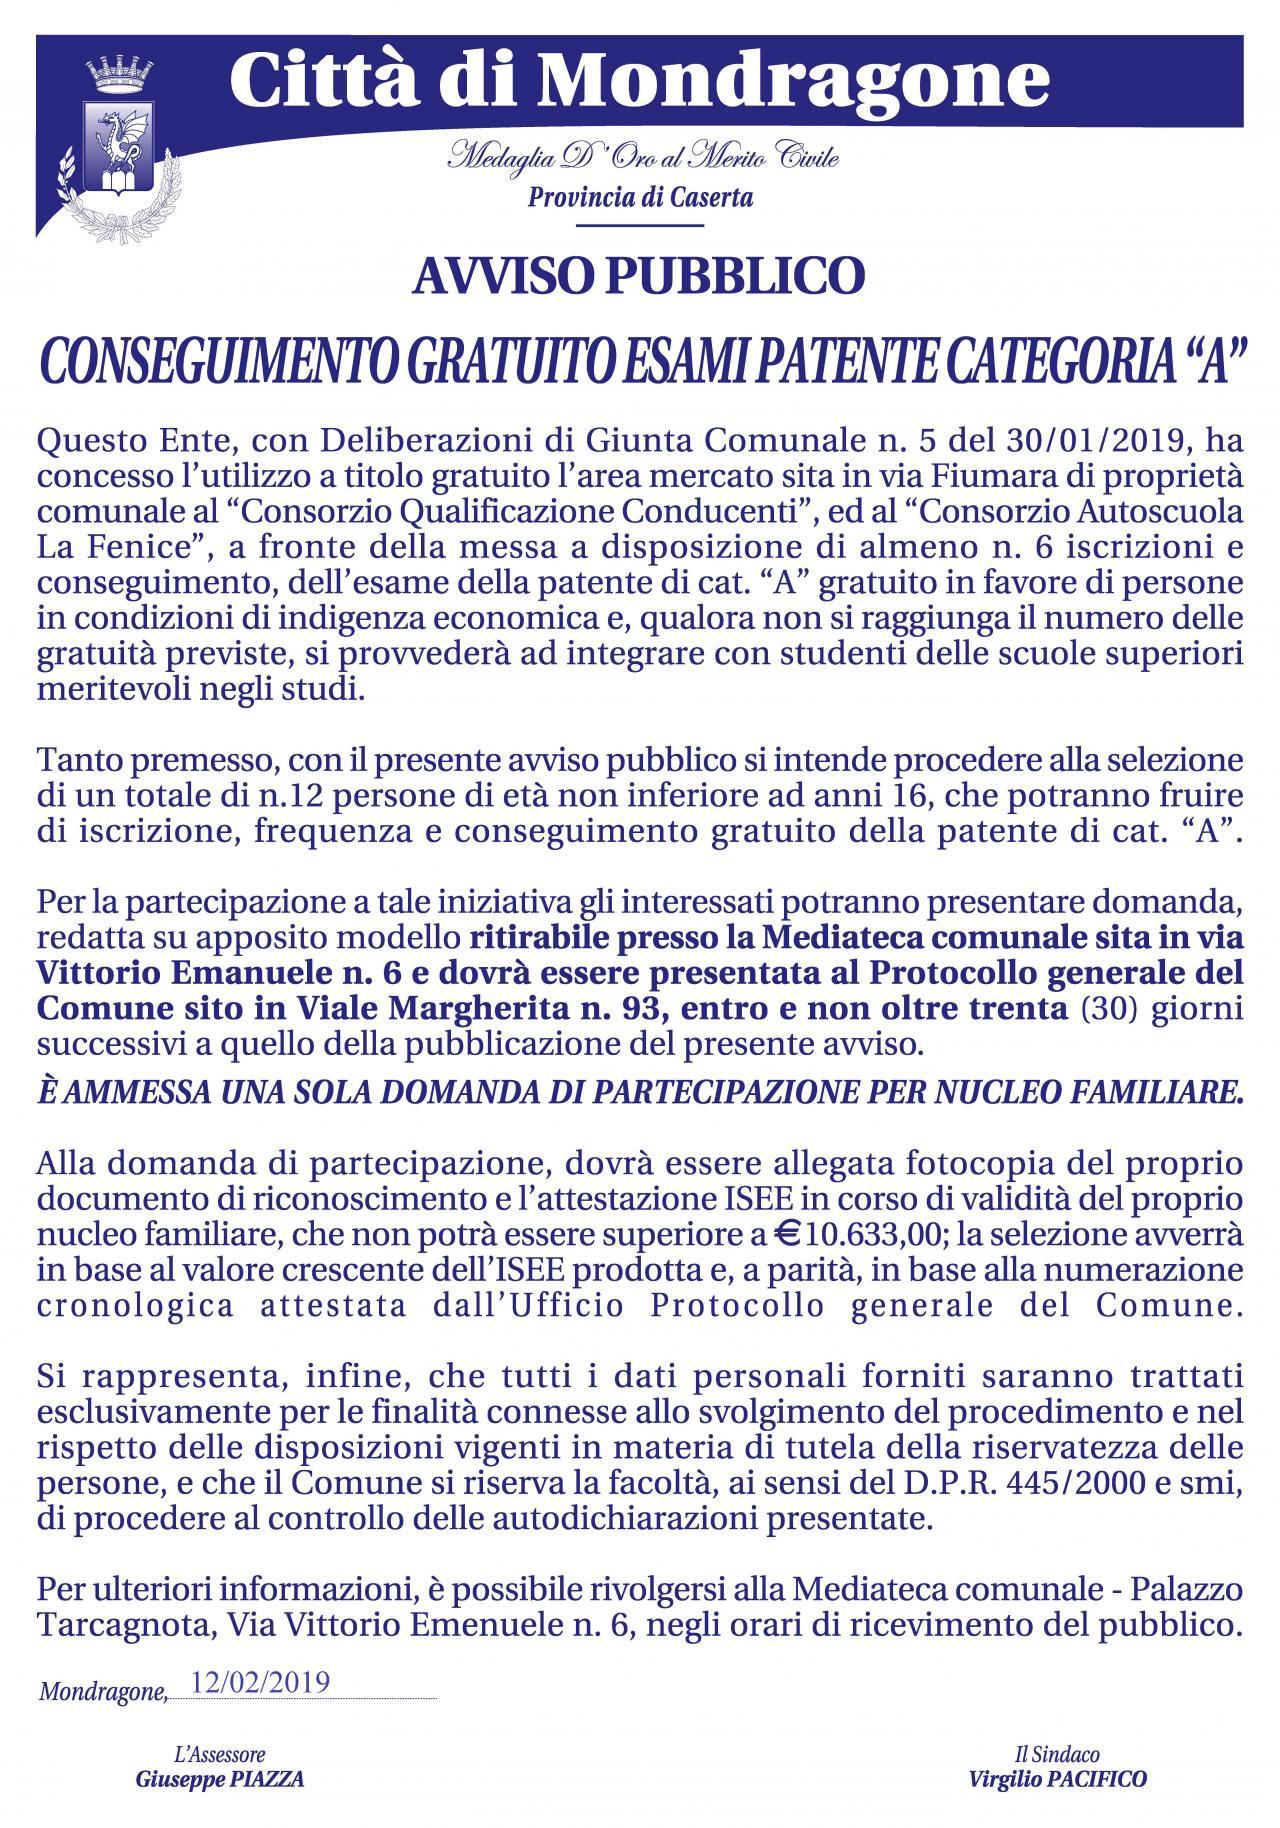 Patente categoria A - categorie svantaggiate